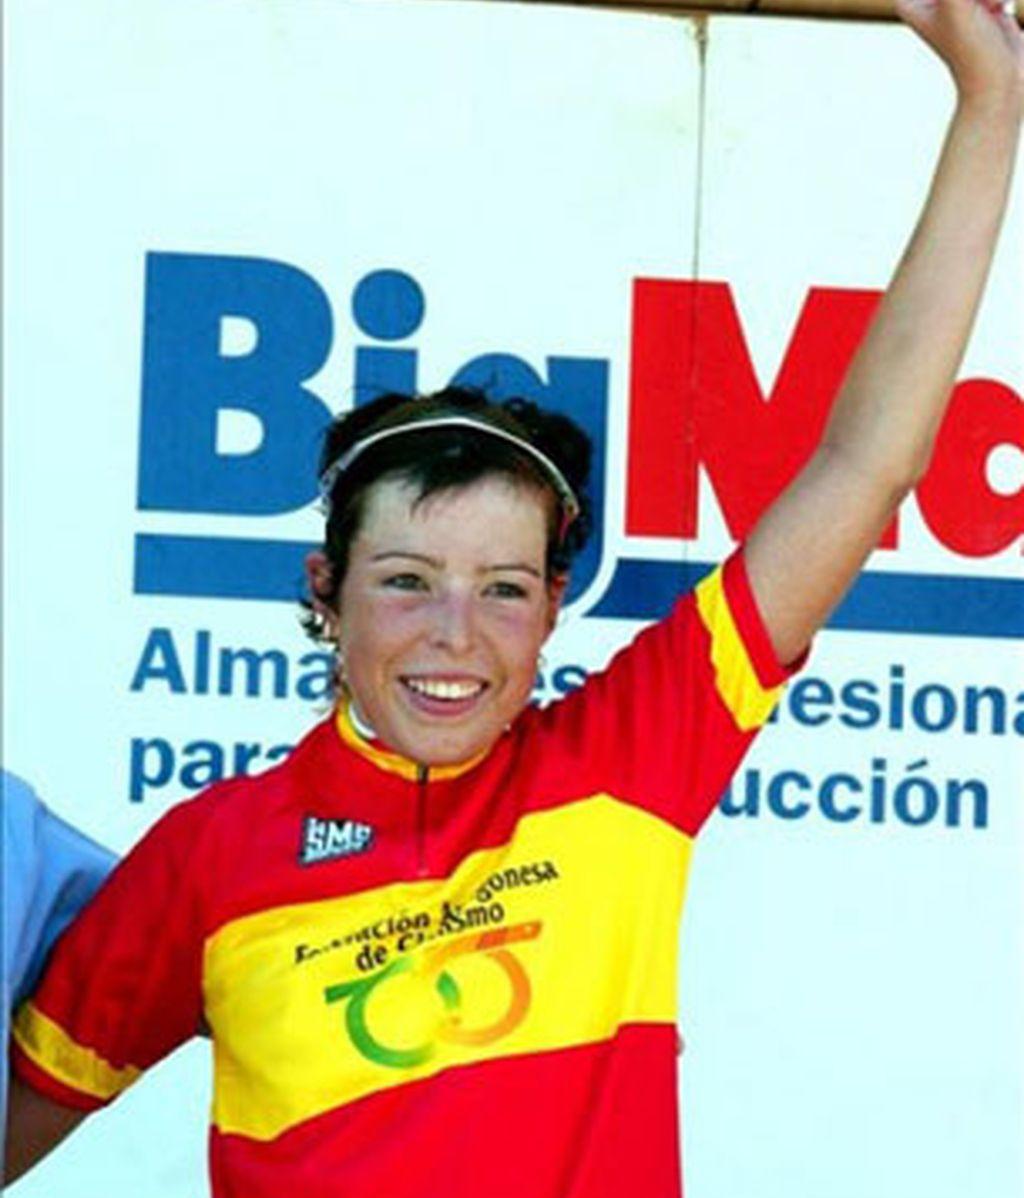 La ciclista española Maribel Moreno da positivo por EPO